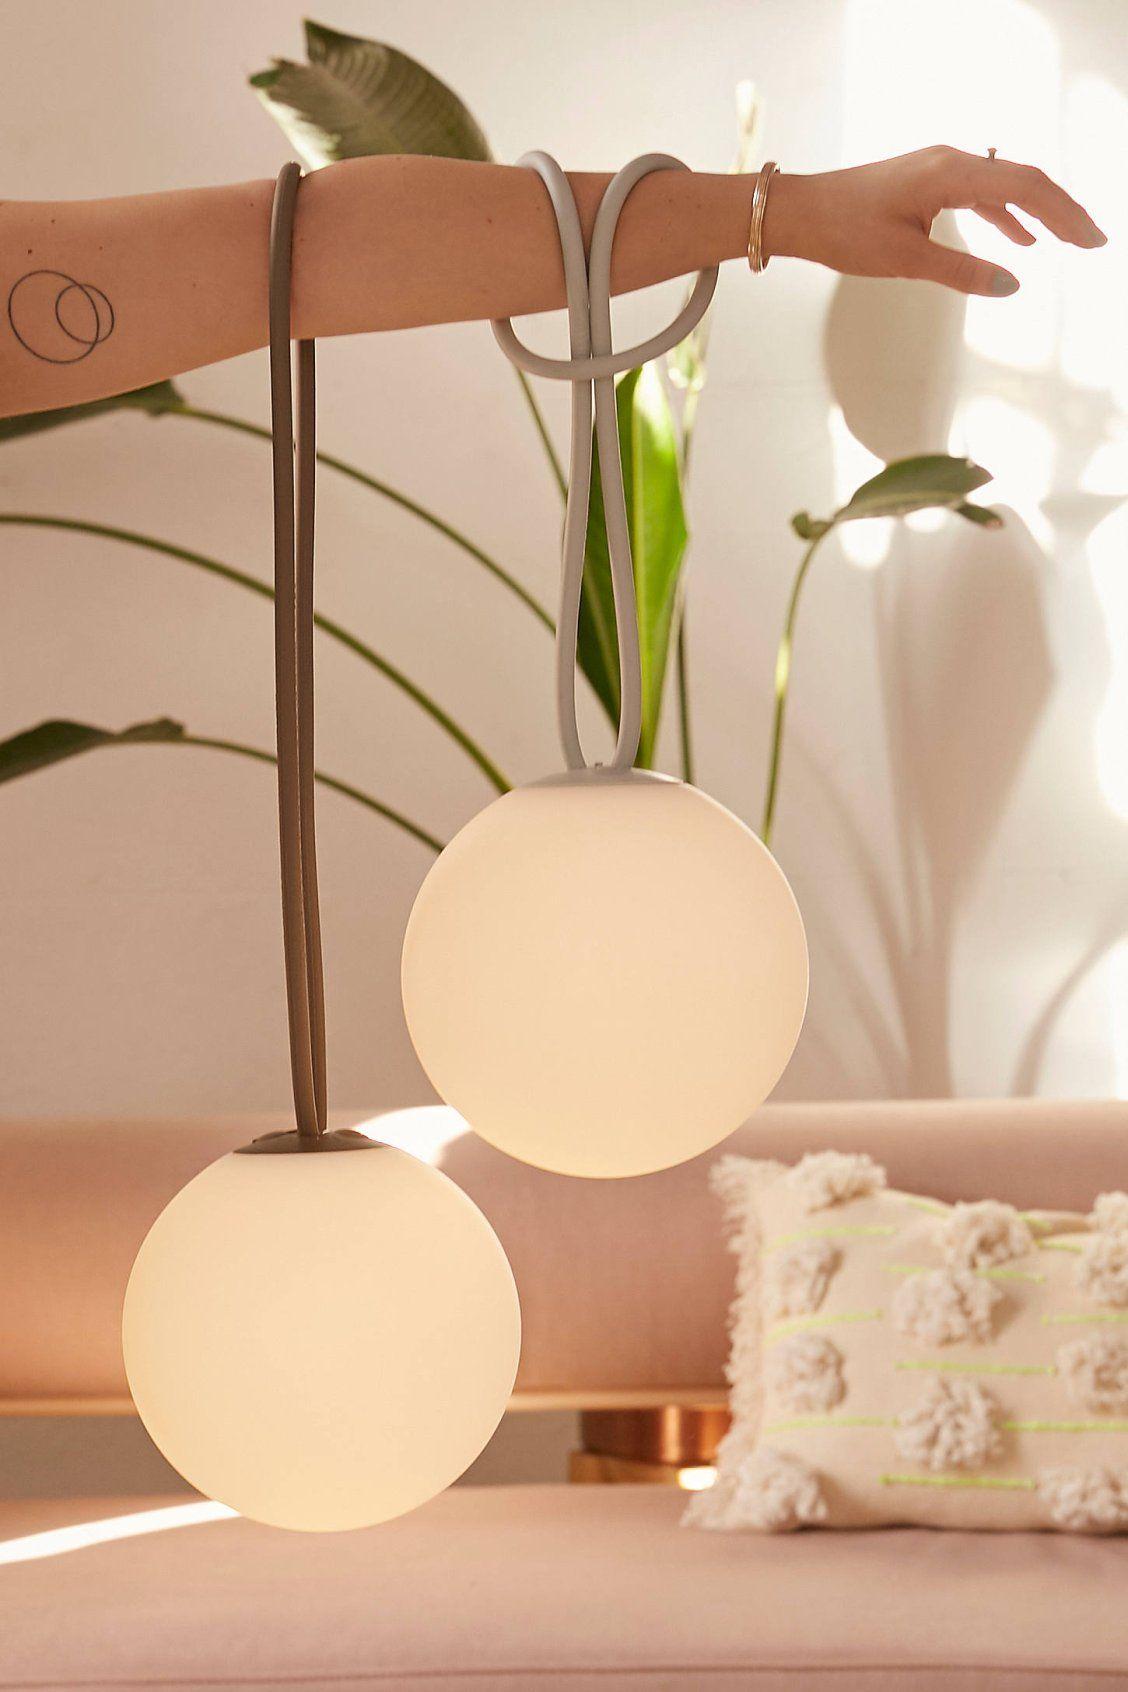 Fatboy Bolleke Rechargeable Hanging Lamp Hanging Lamp Lamp Design Outdoor Lamp